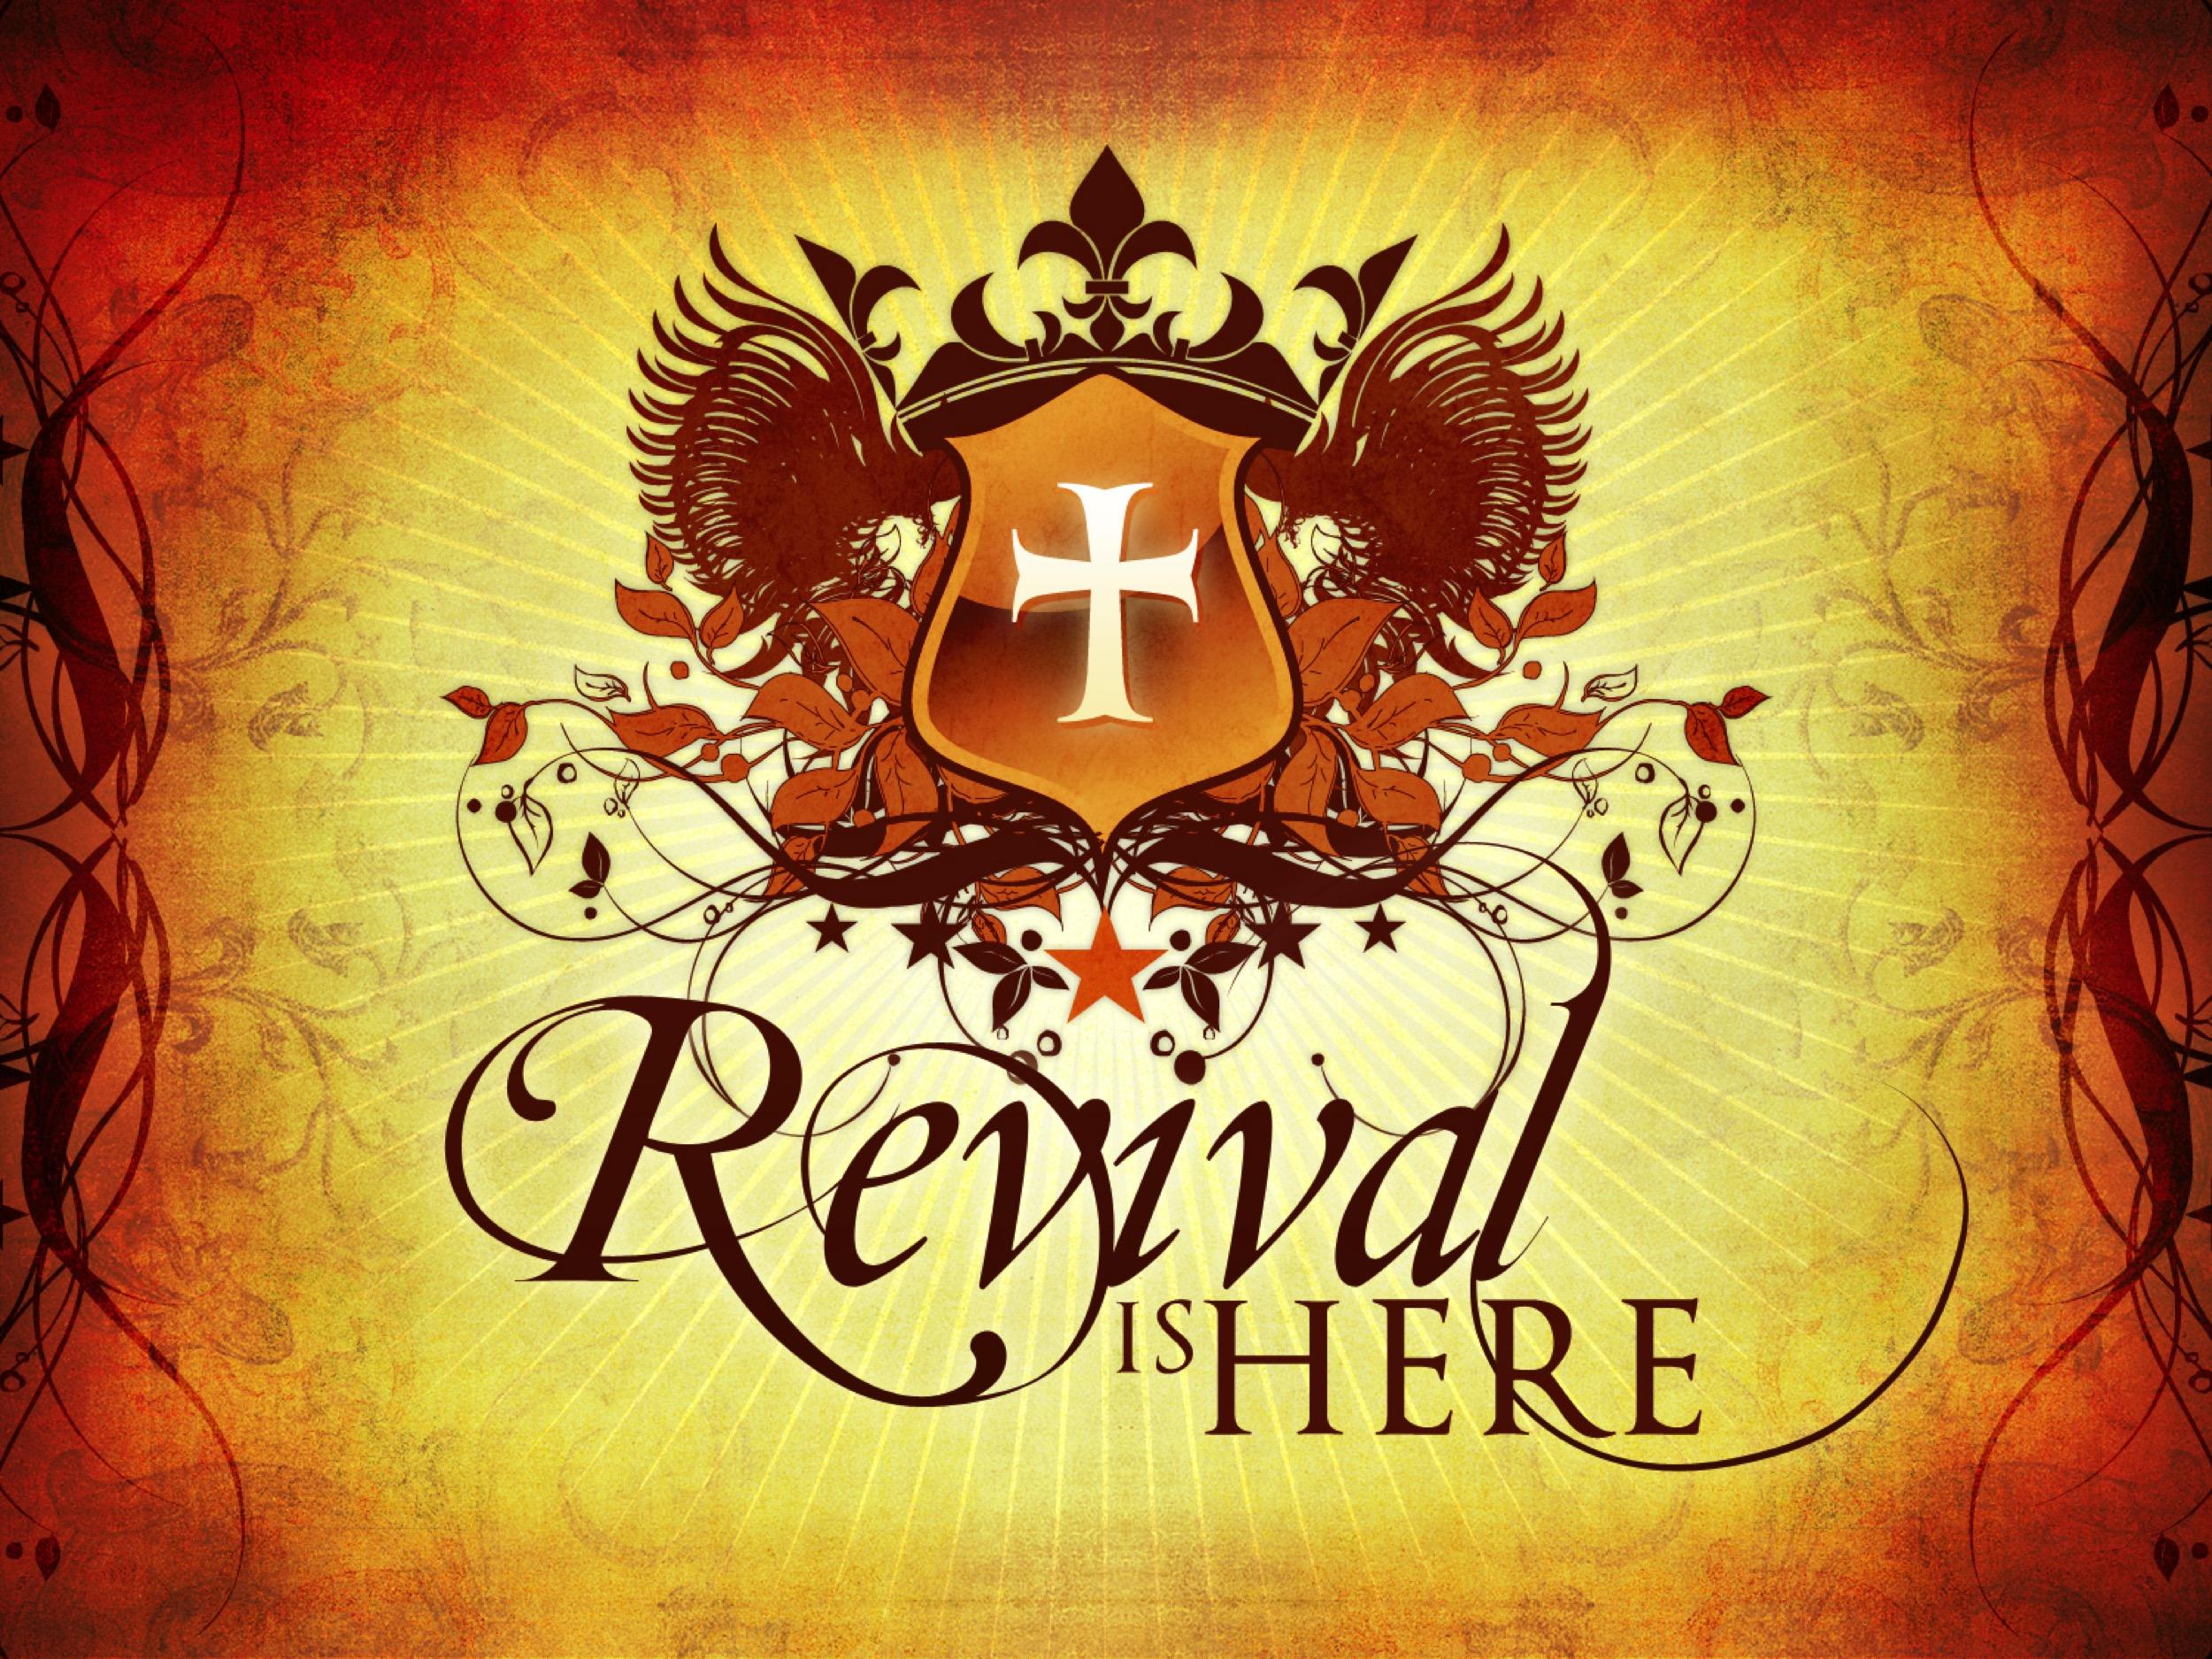 Revival P3